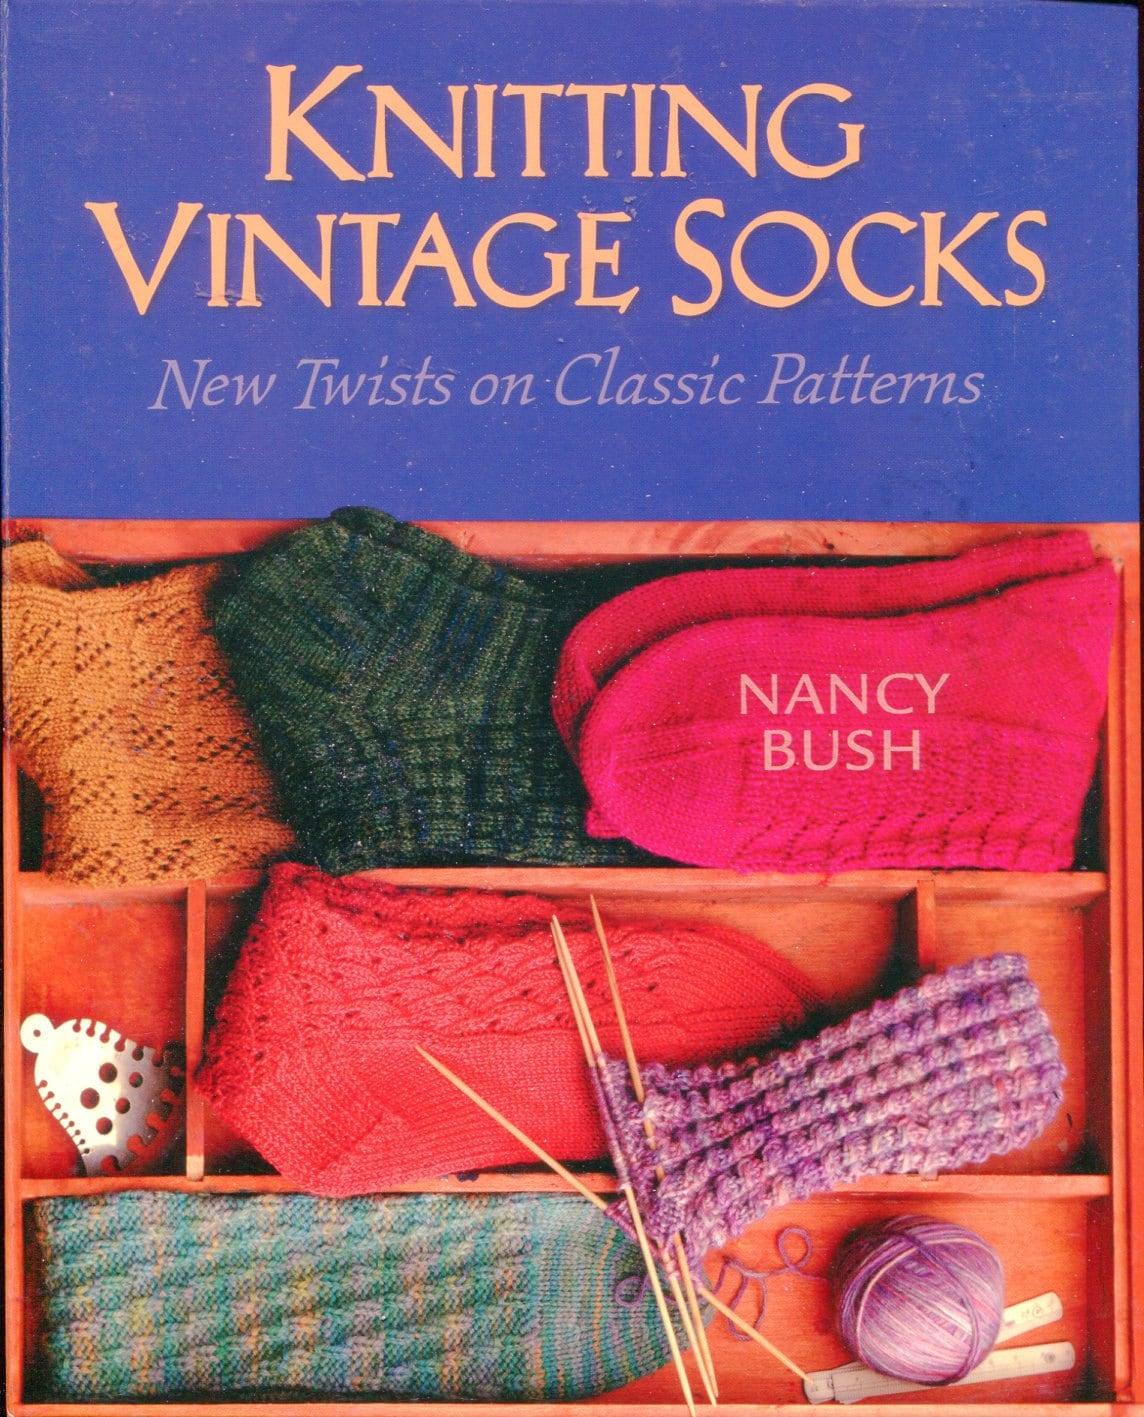 Knitting Vintage Socks Nancy Bush : Knitting vintage socks book new twists on classic patterns